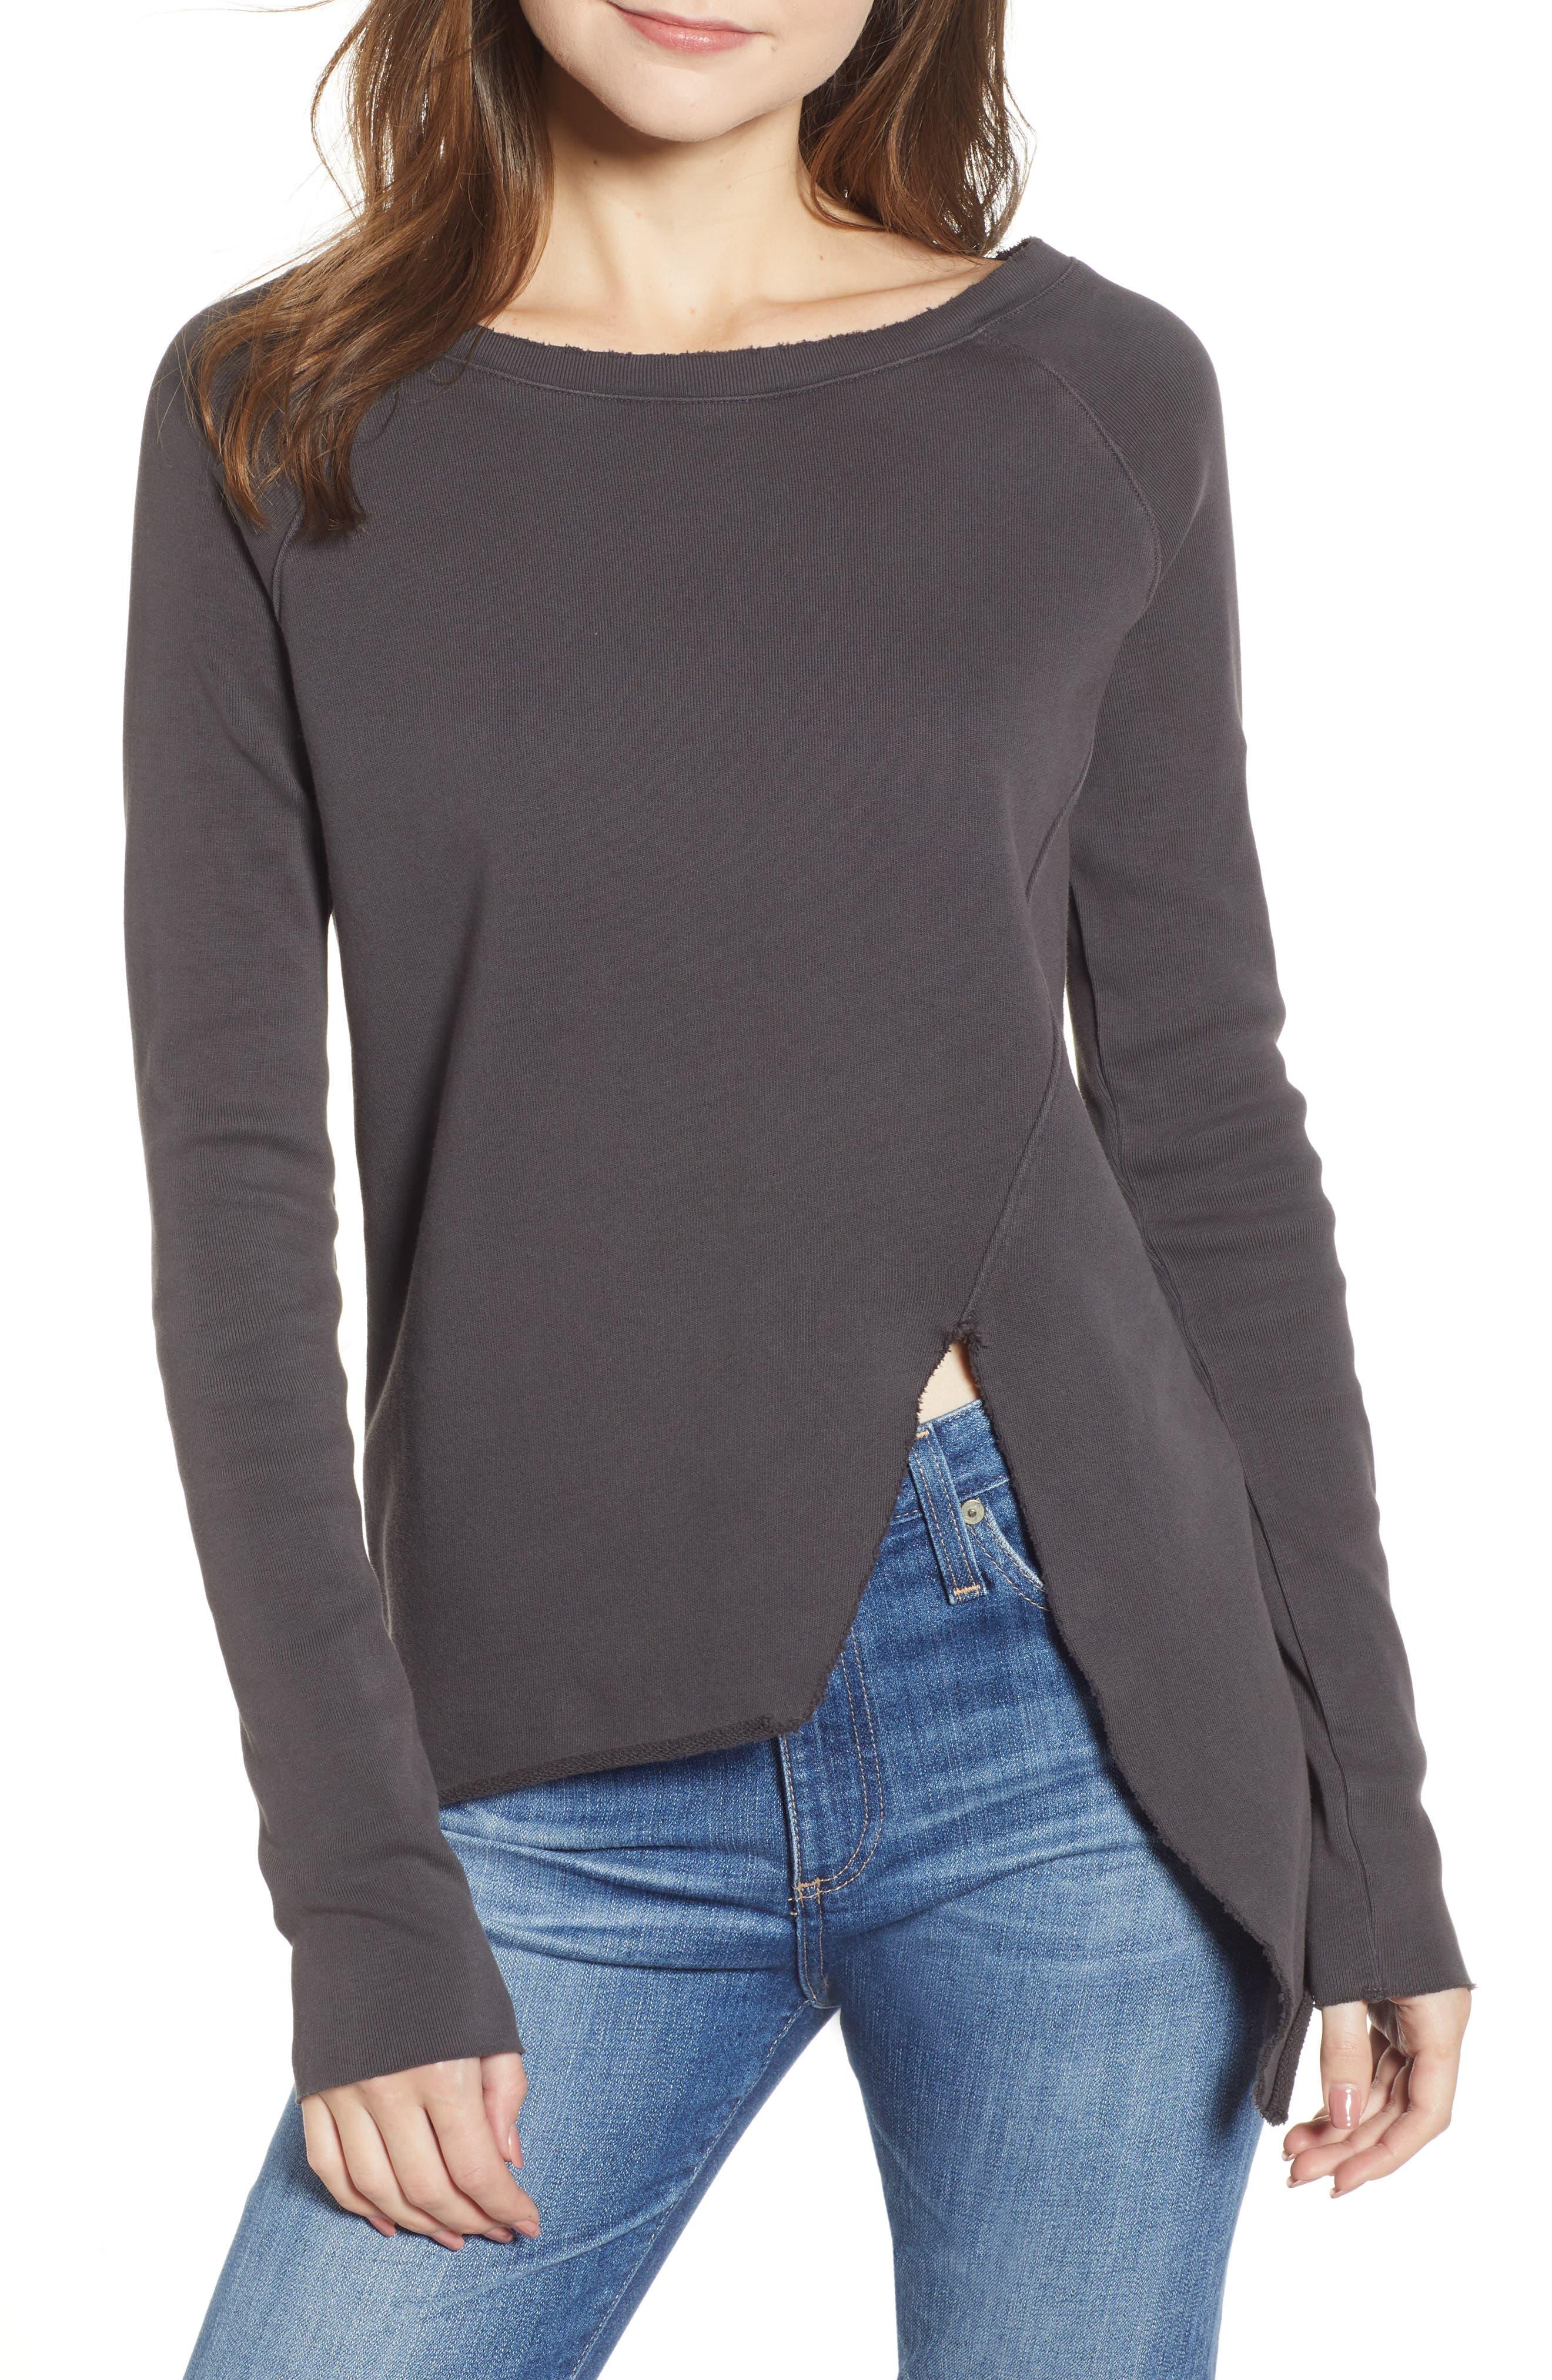 b67589173fb New Women s Sweatshirts   Hoodies Clothing